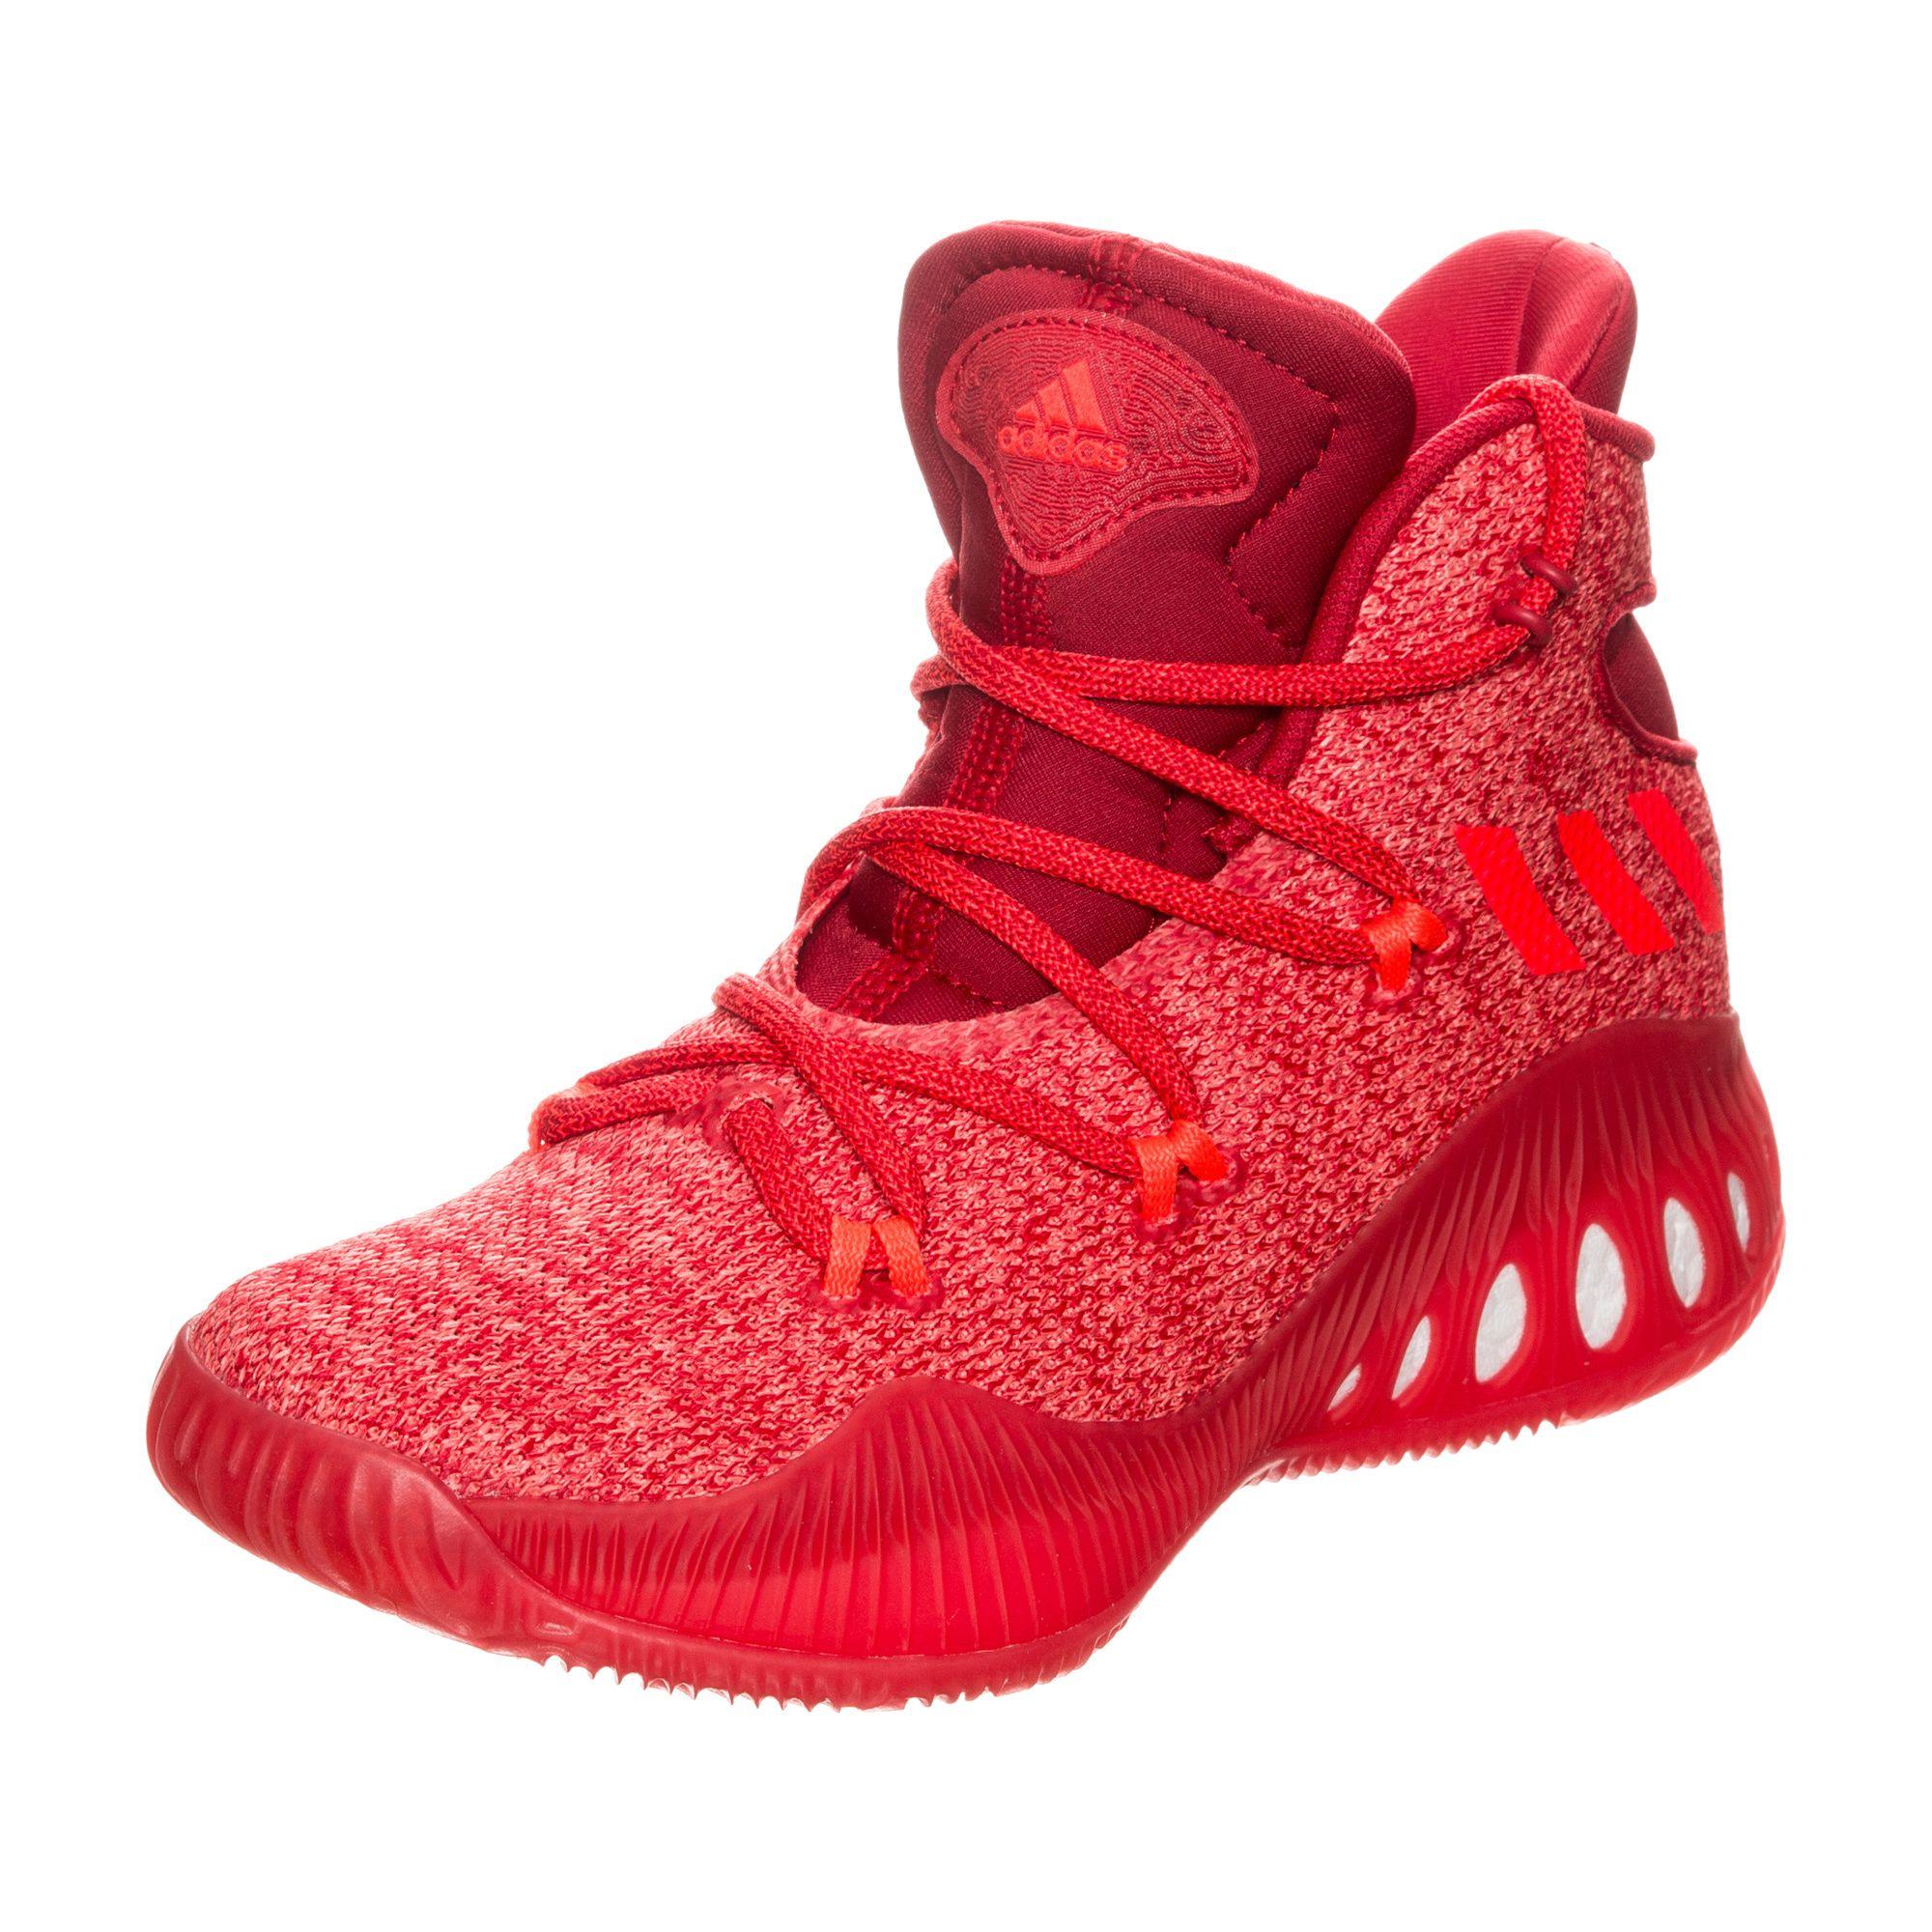 ADIDAS PERFORMANCE adidas Performance Crazy Explosive Basketballschuh Kinder